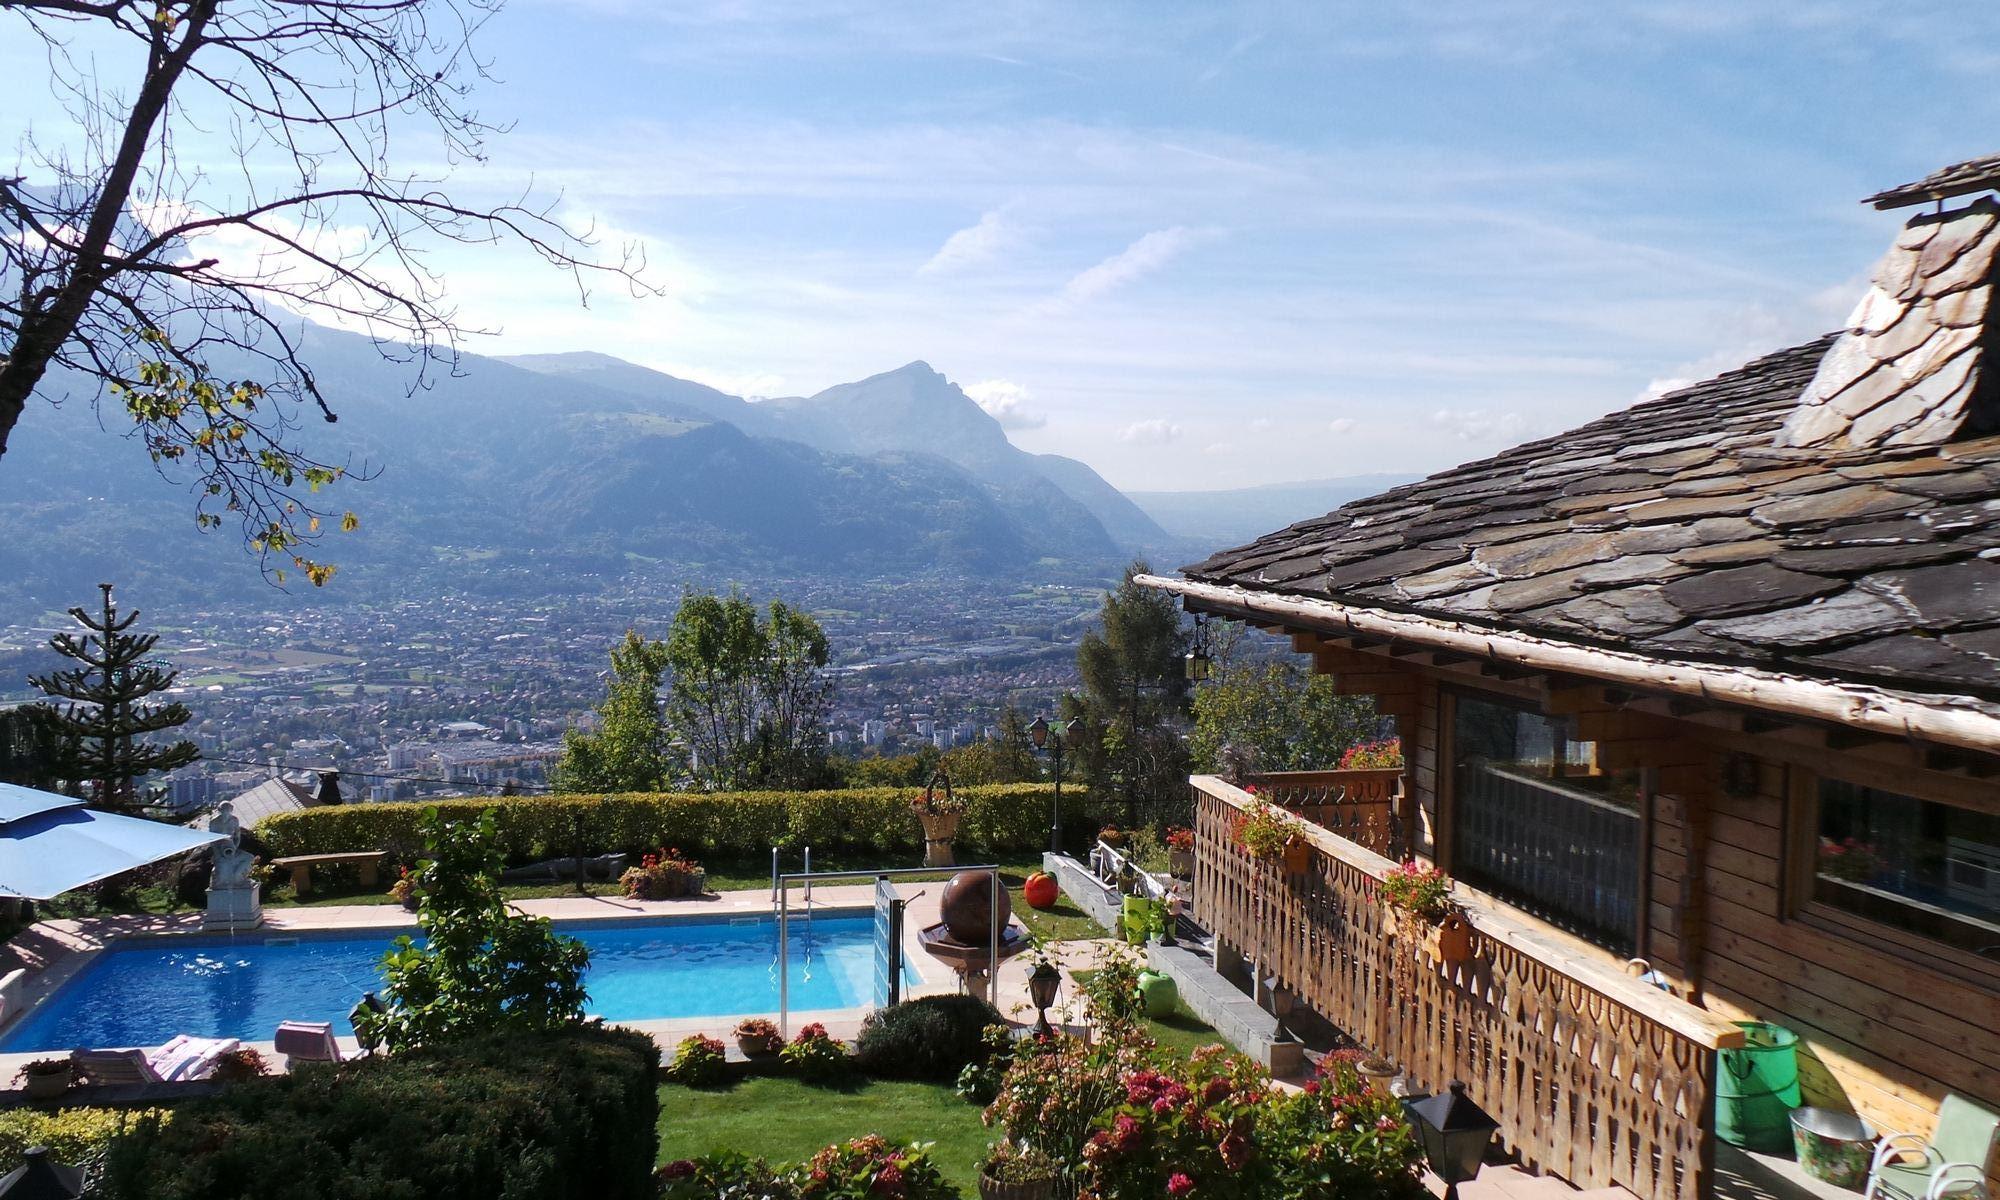 Property For Sale at Chatillon sur Cluses - Villa Archimede